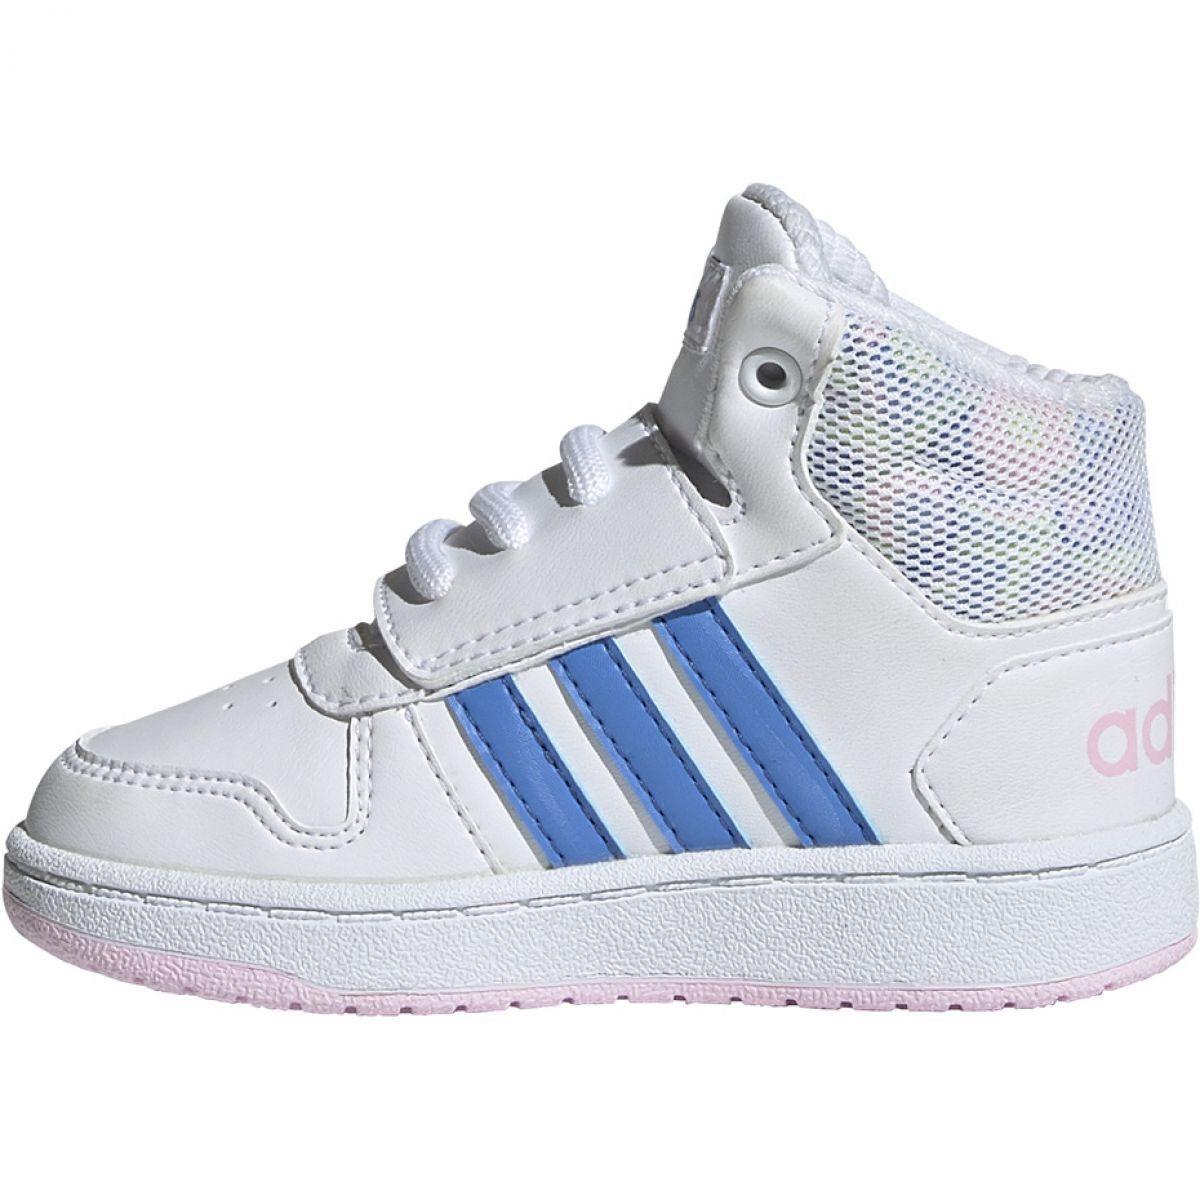 Buty Adidas Hoops Mid 2 0 I Jr Ee8550 Biale Adidas Kids Shoes Sports Shoes Adidas Adidas